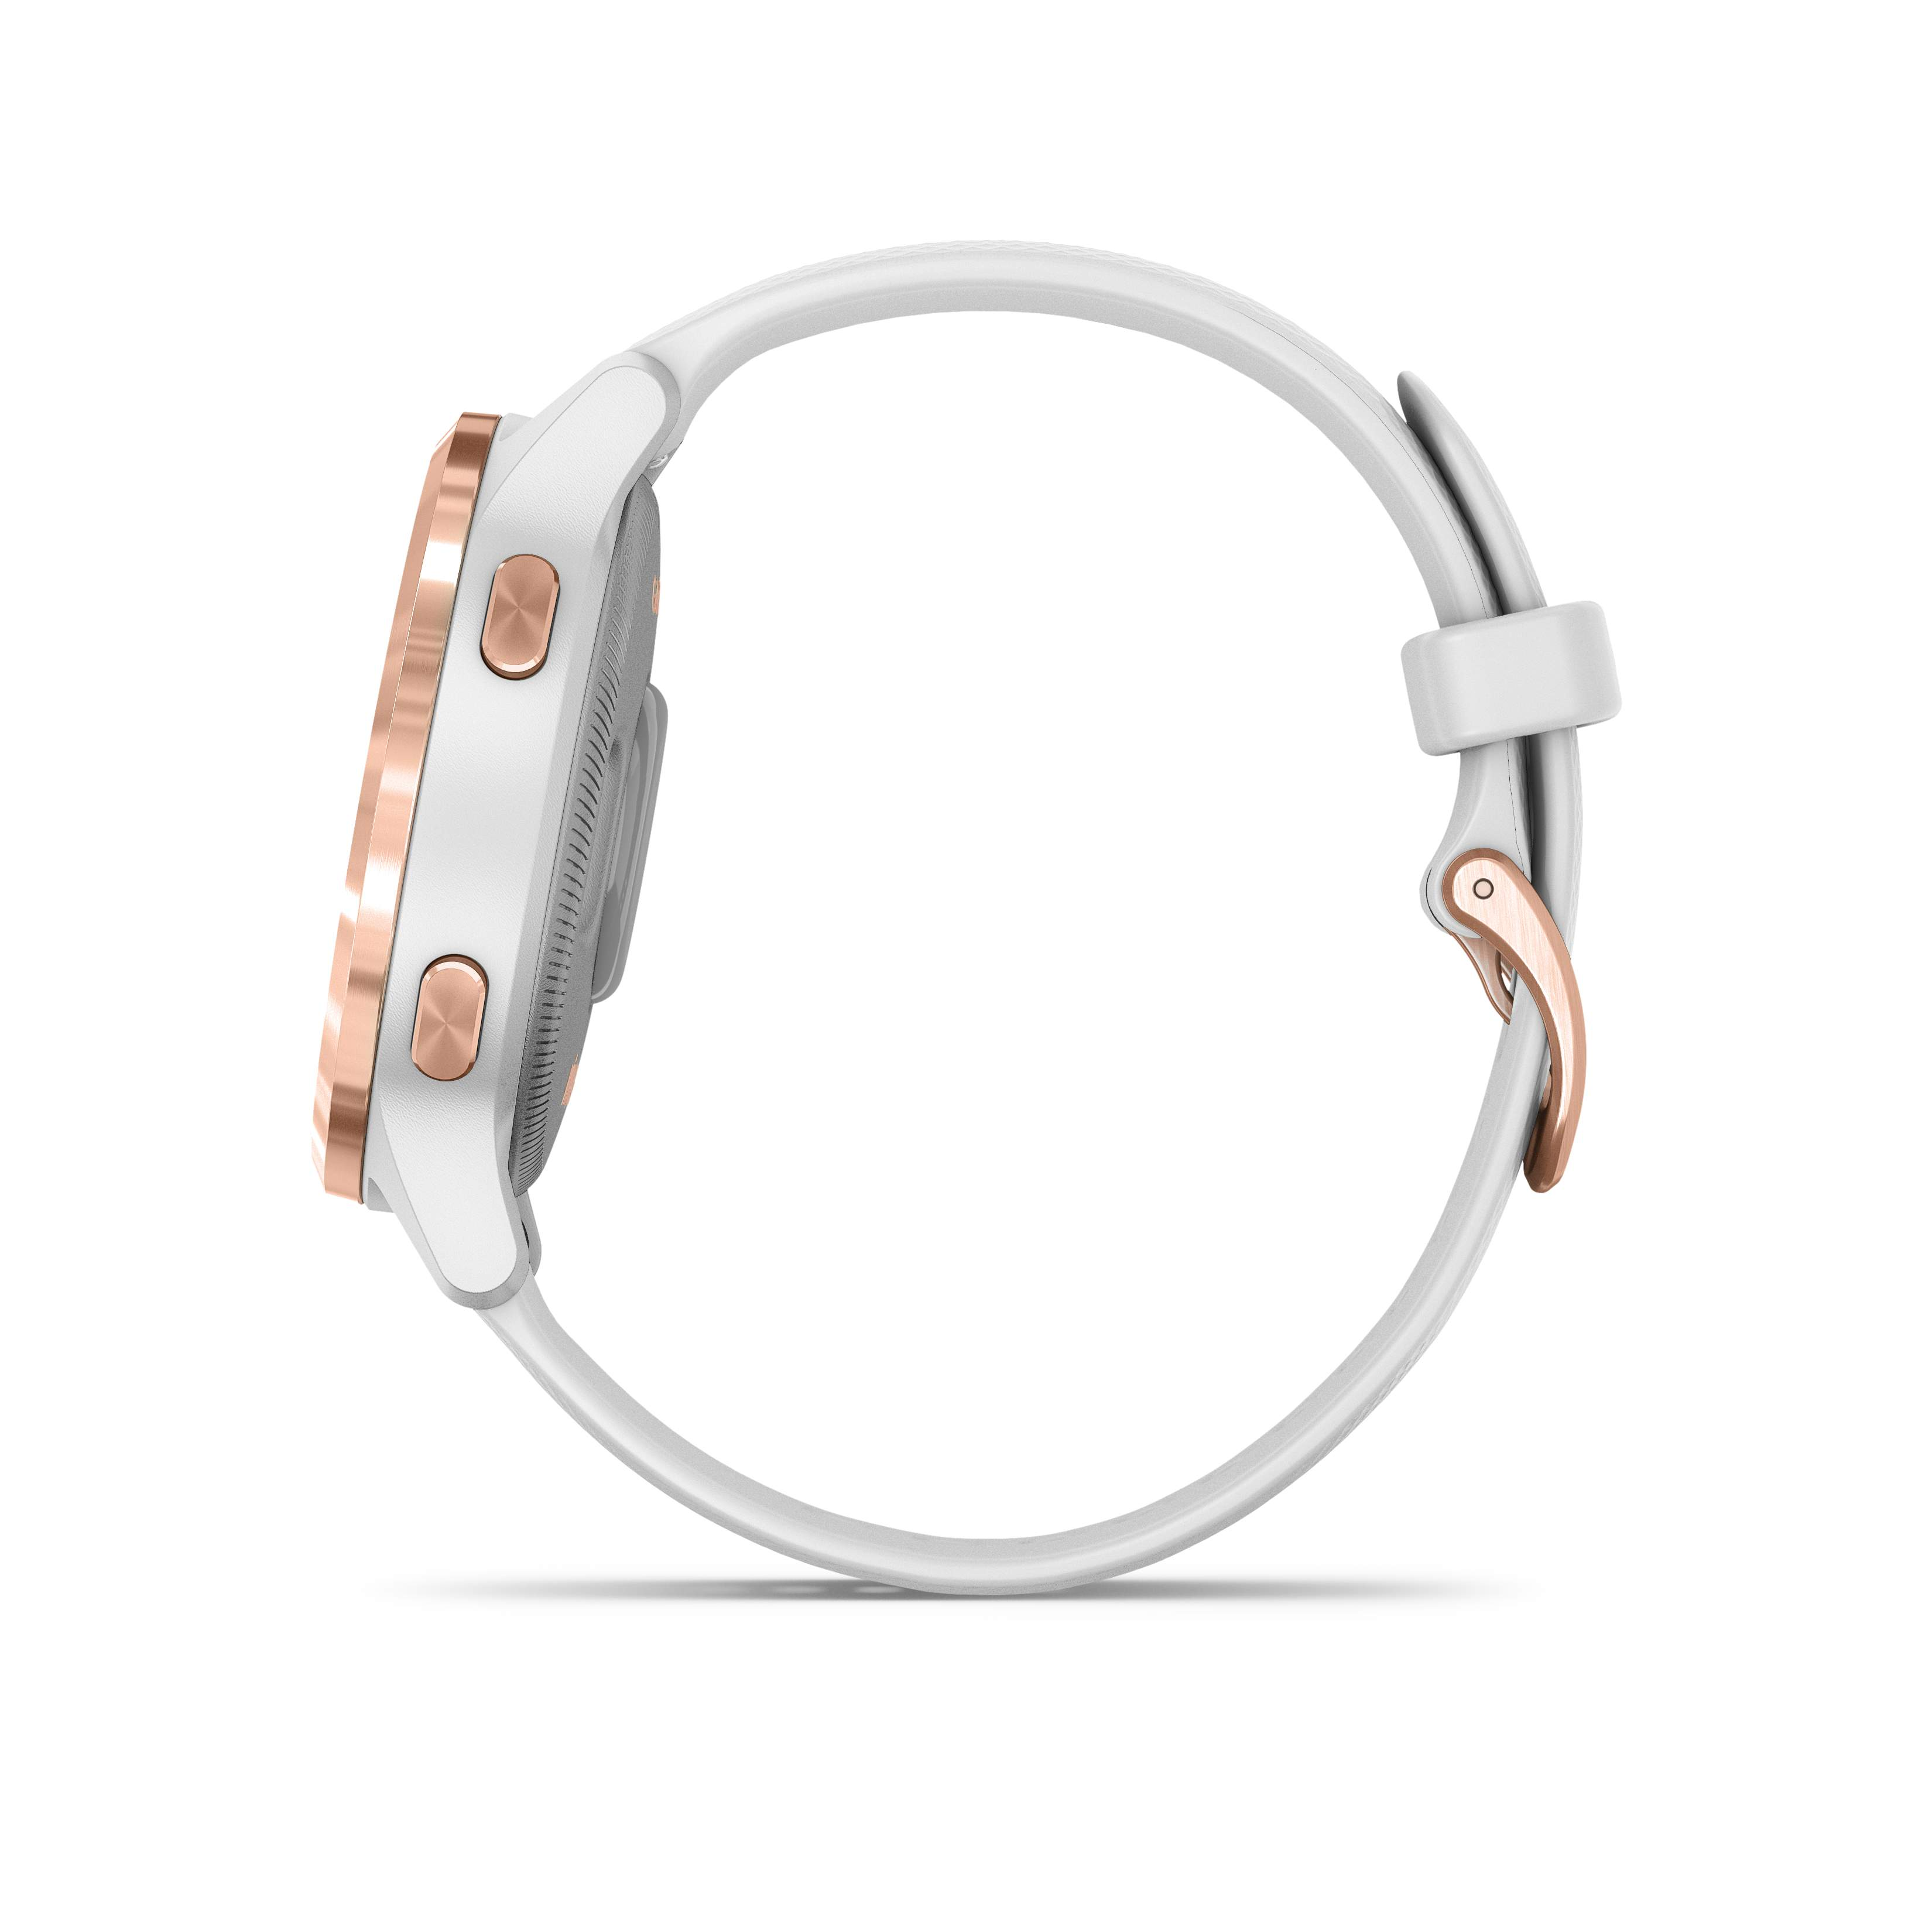 VIVOACTIVE 4S Weiss/Rosegold Metall-Luenette mit Schnellwechsel-Silikon-Armband 18mm